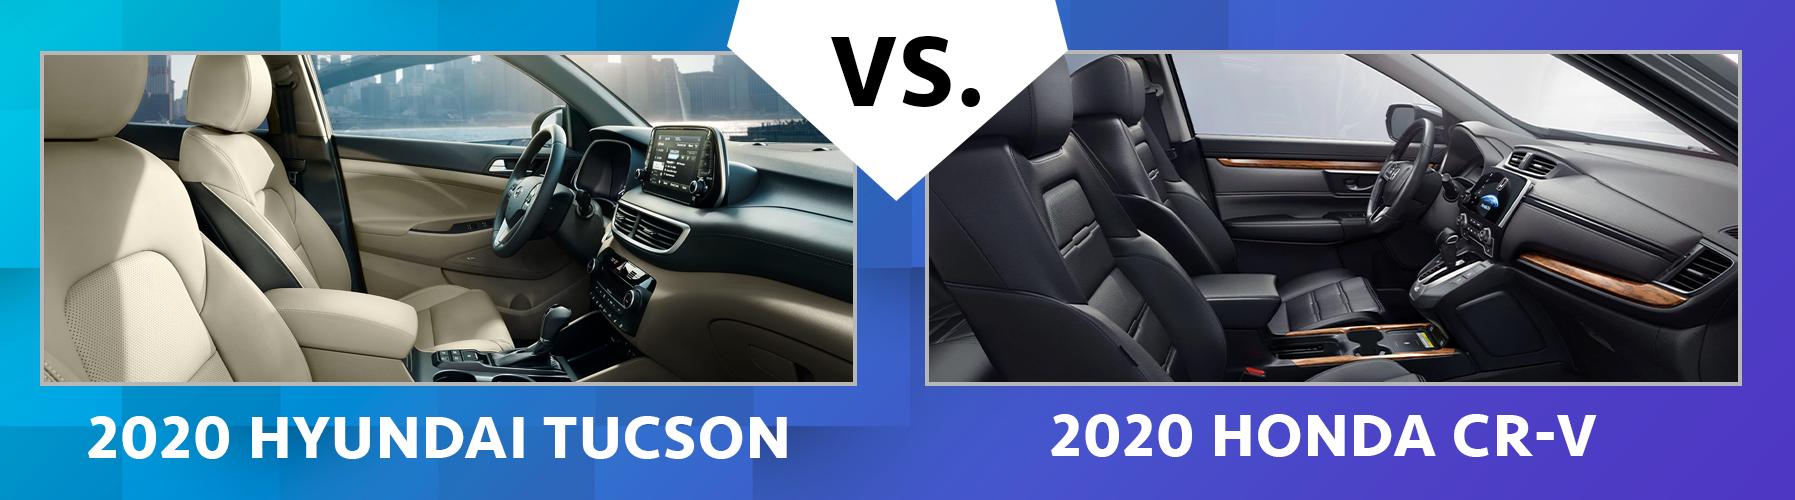 2020 Tucson vs 2020 CR-V Fuel Efficiency